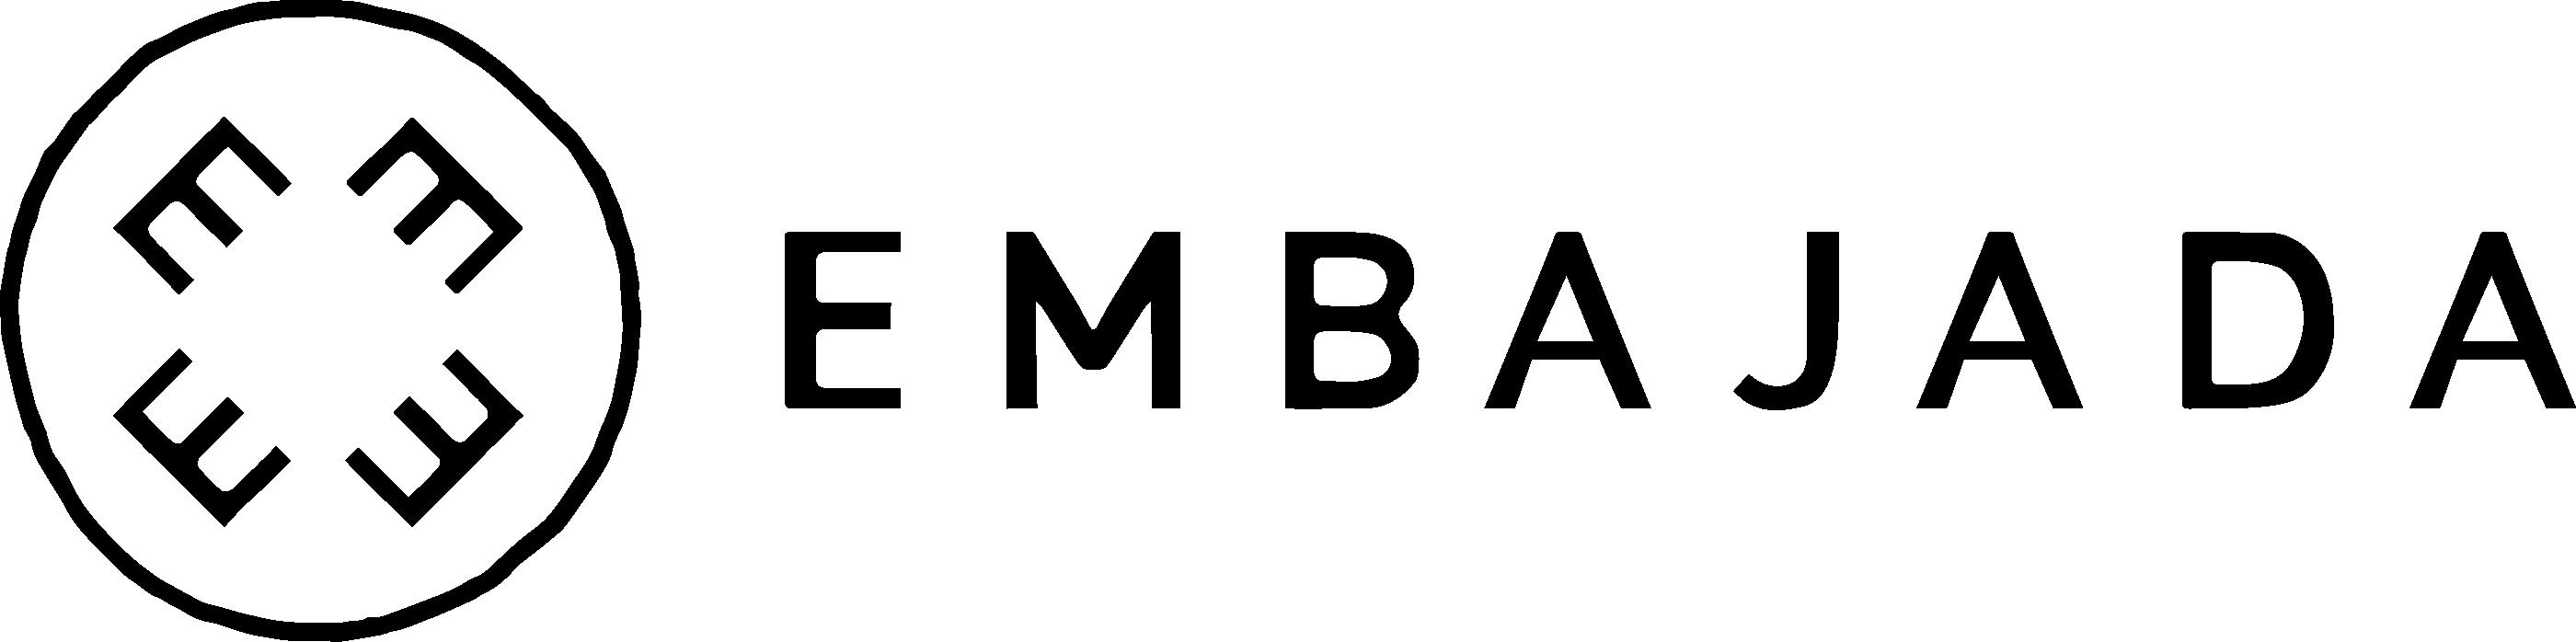 embajada anual (hasta agosto 2017)